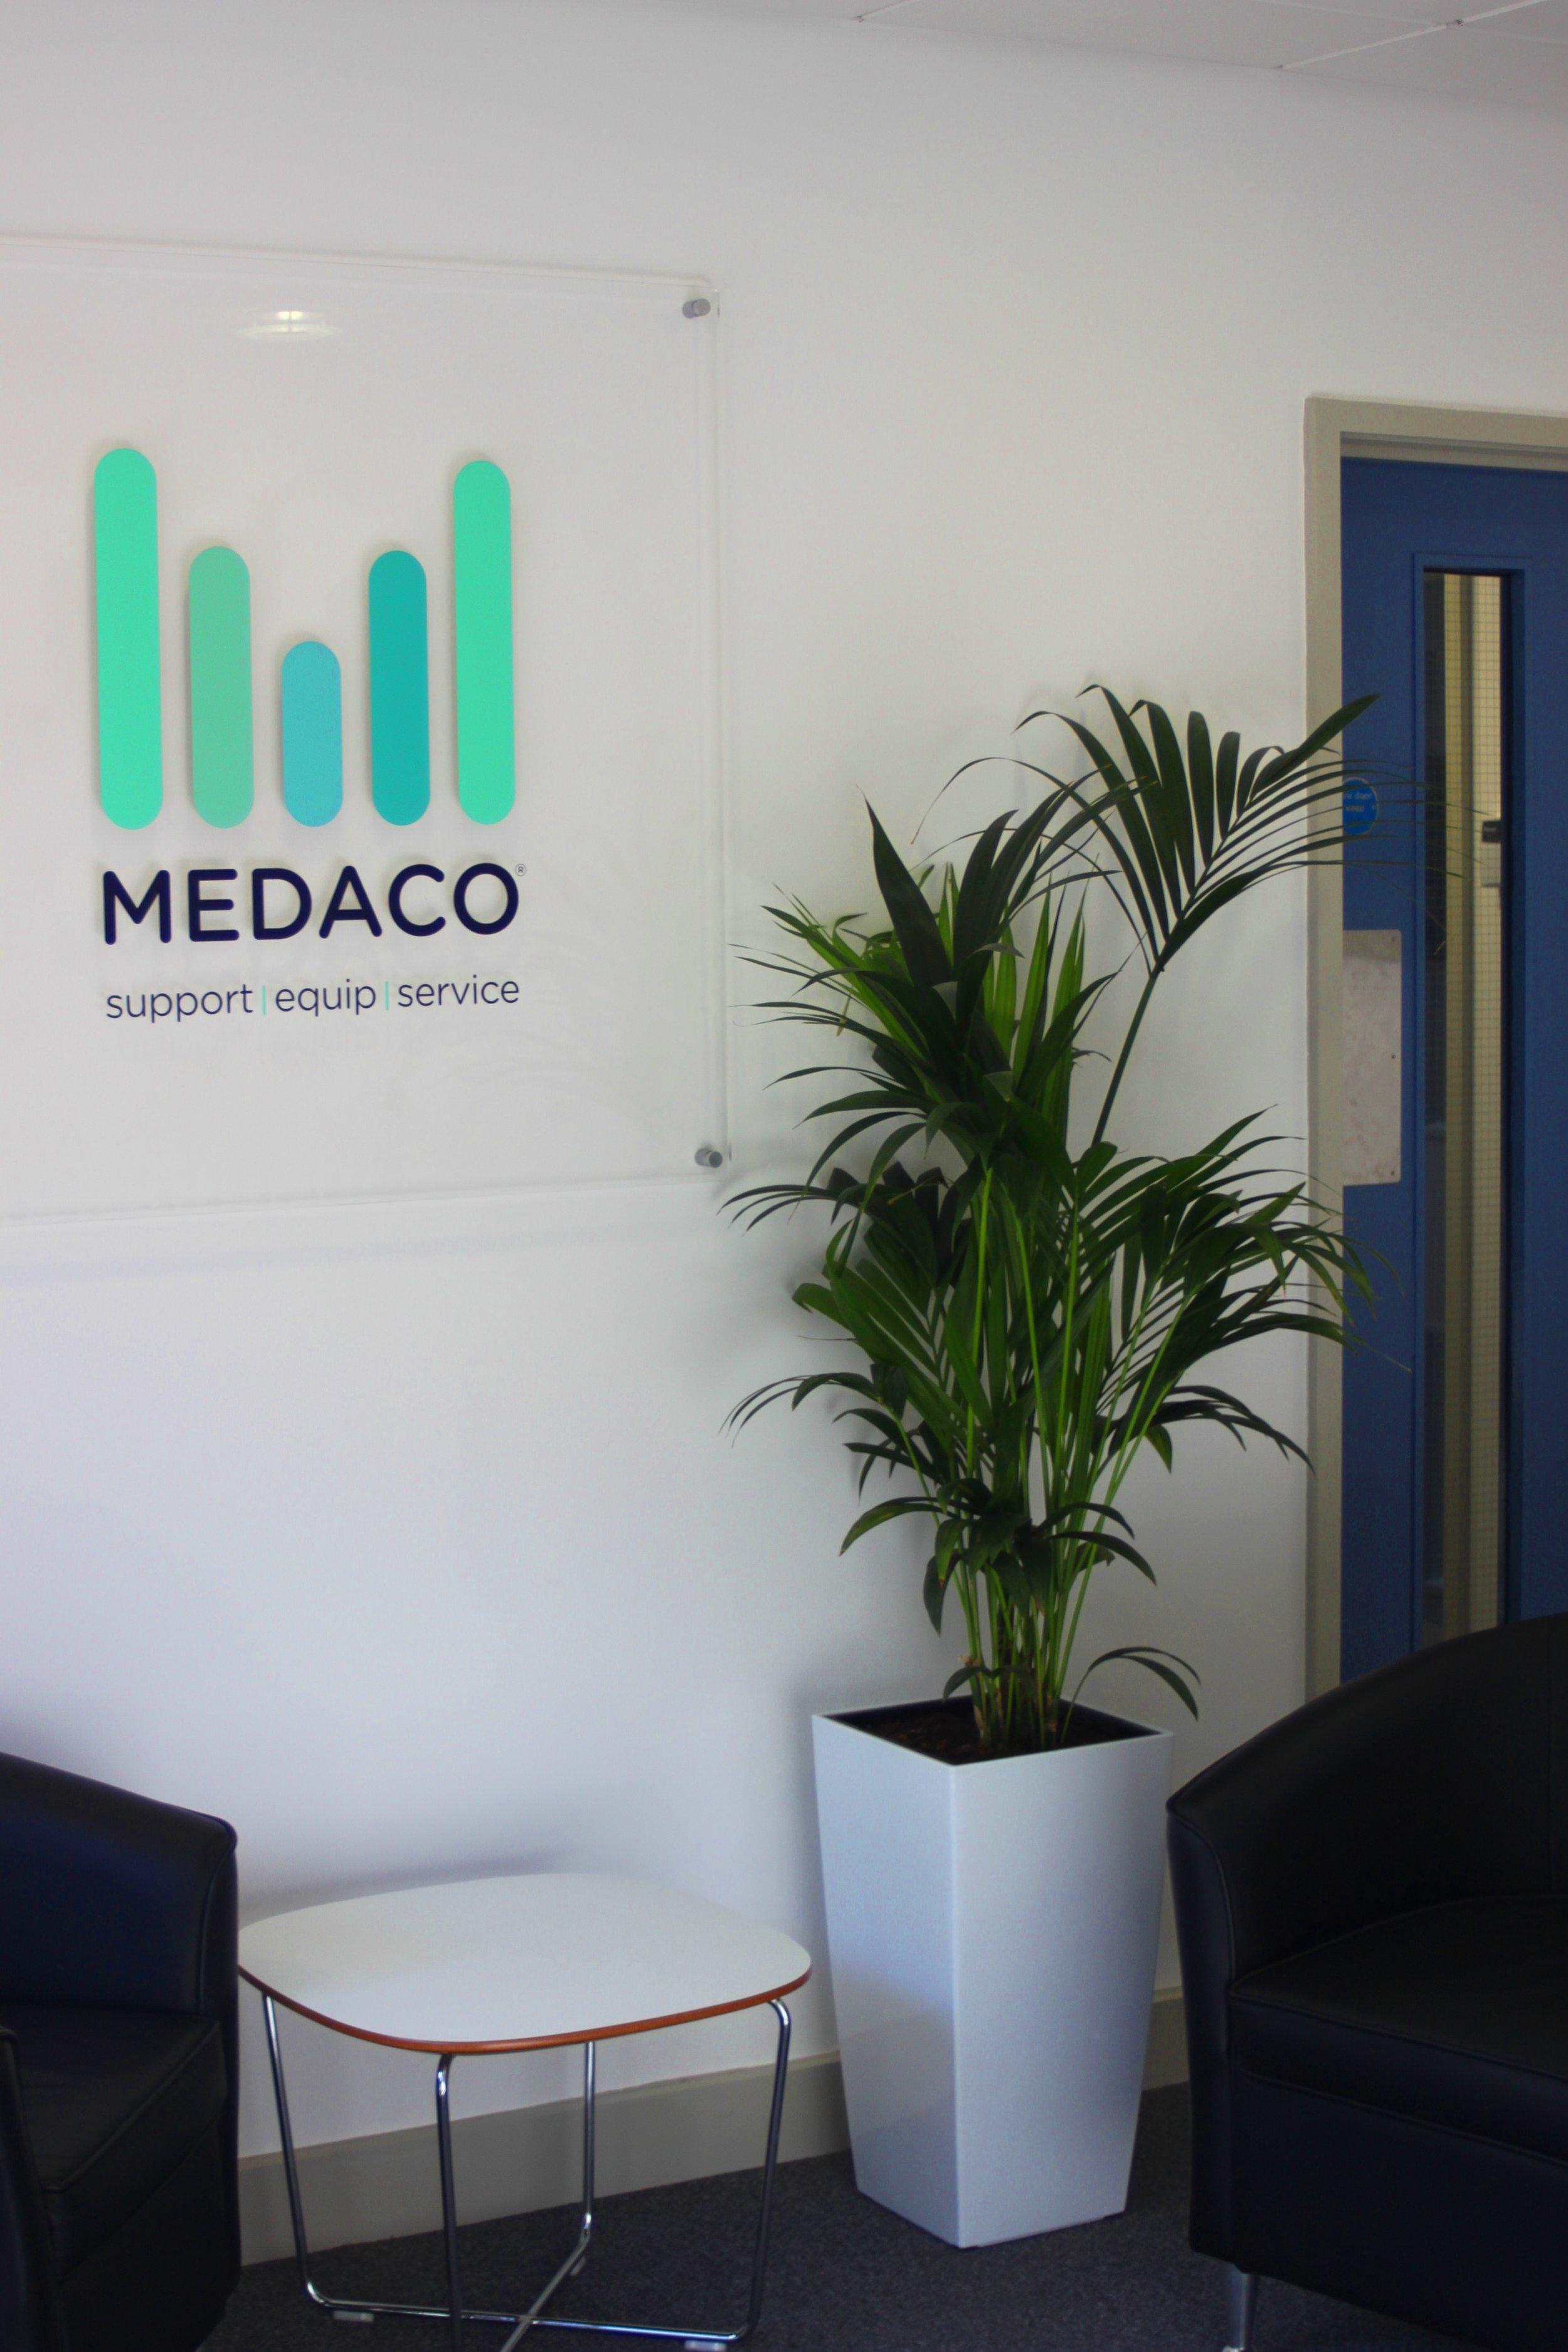 medaco-plantcare-interior-plants-trees-bristol-image-1